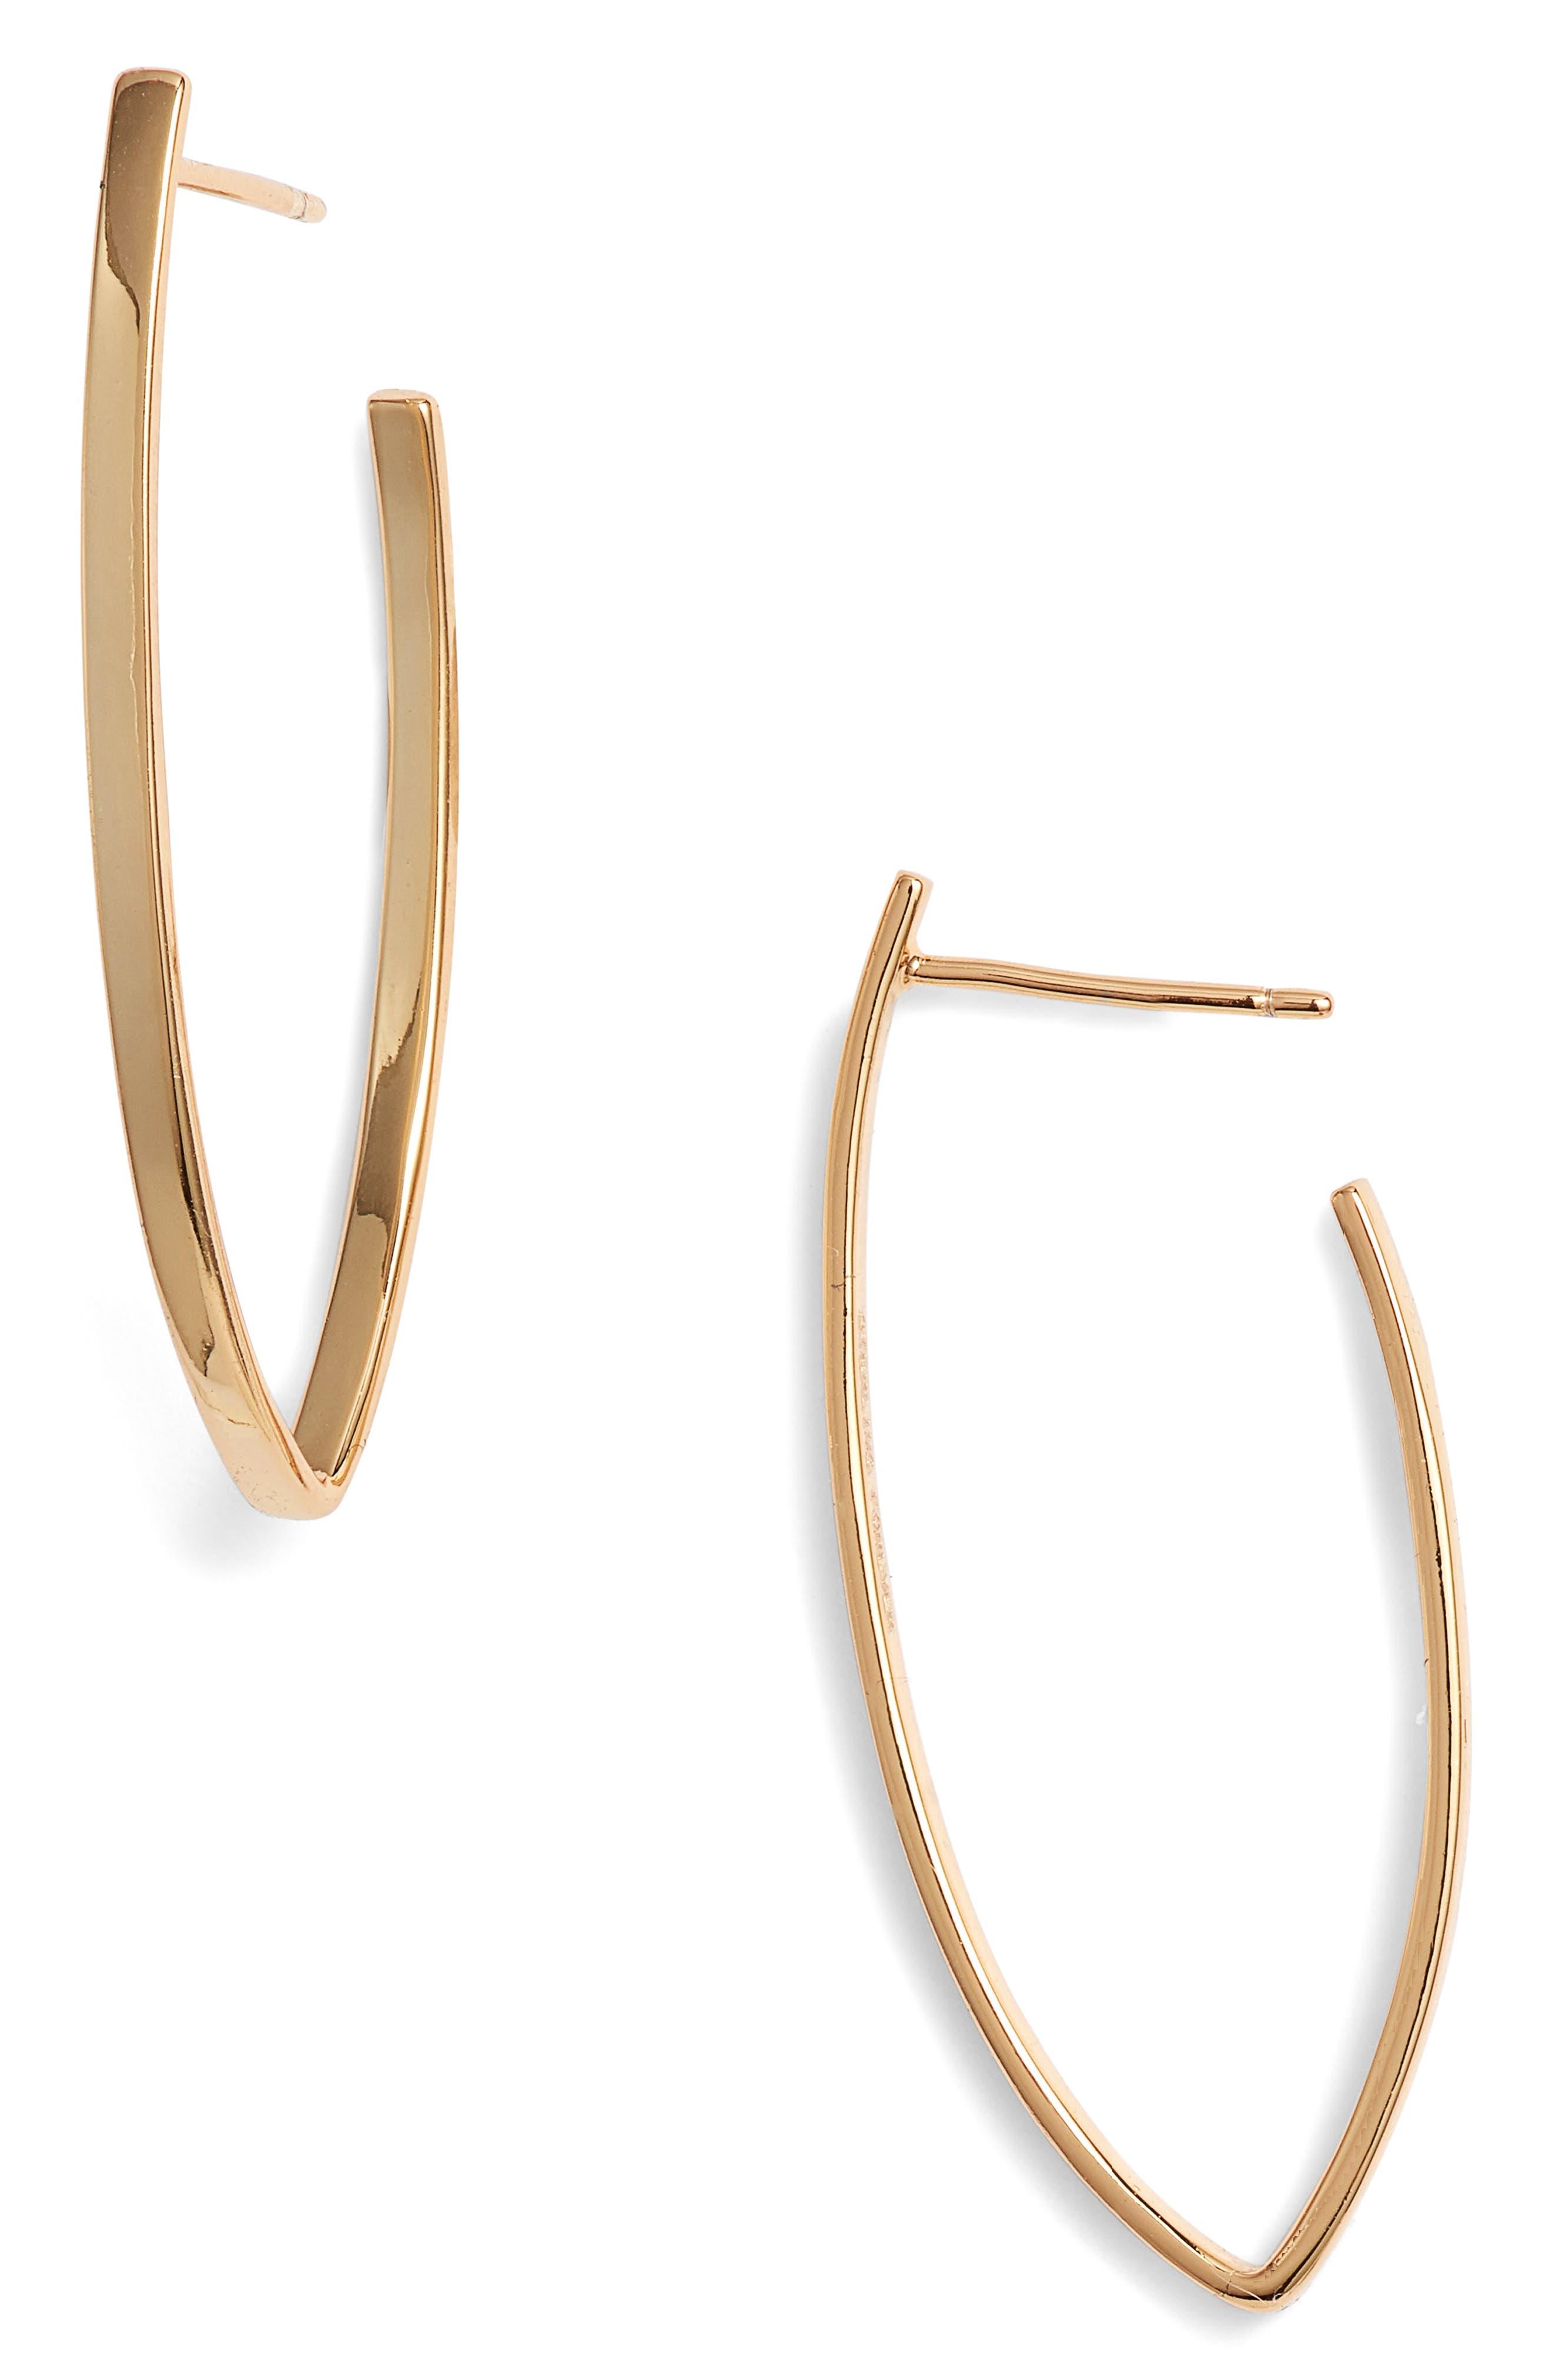 Gold Drop Earrings,                             Main thumbnail 1, color,                             710